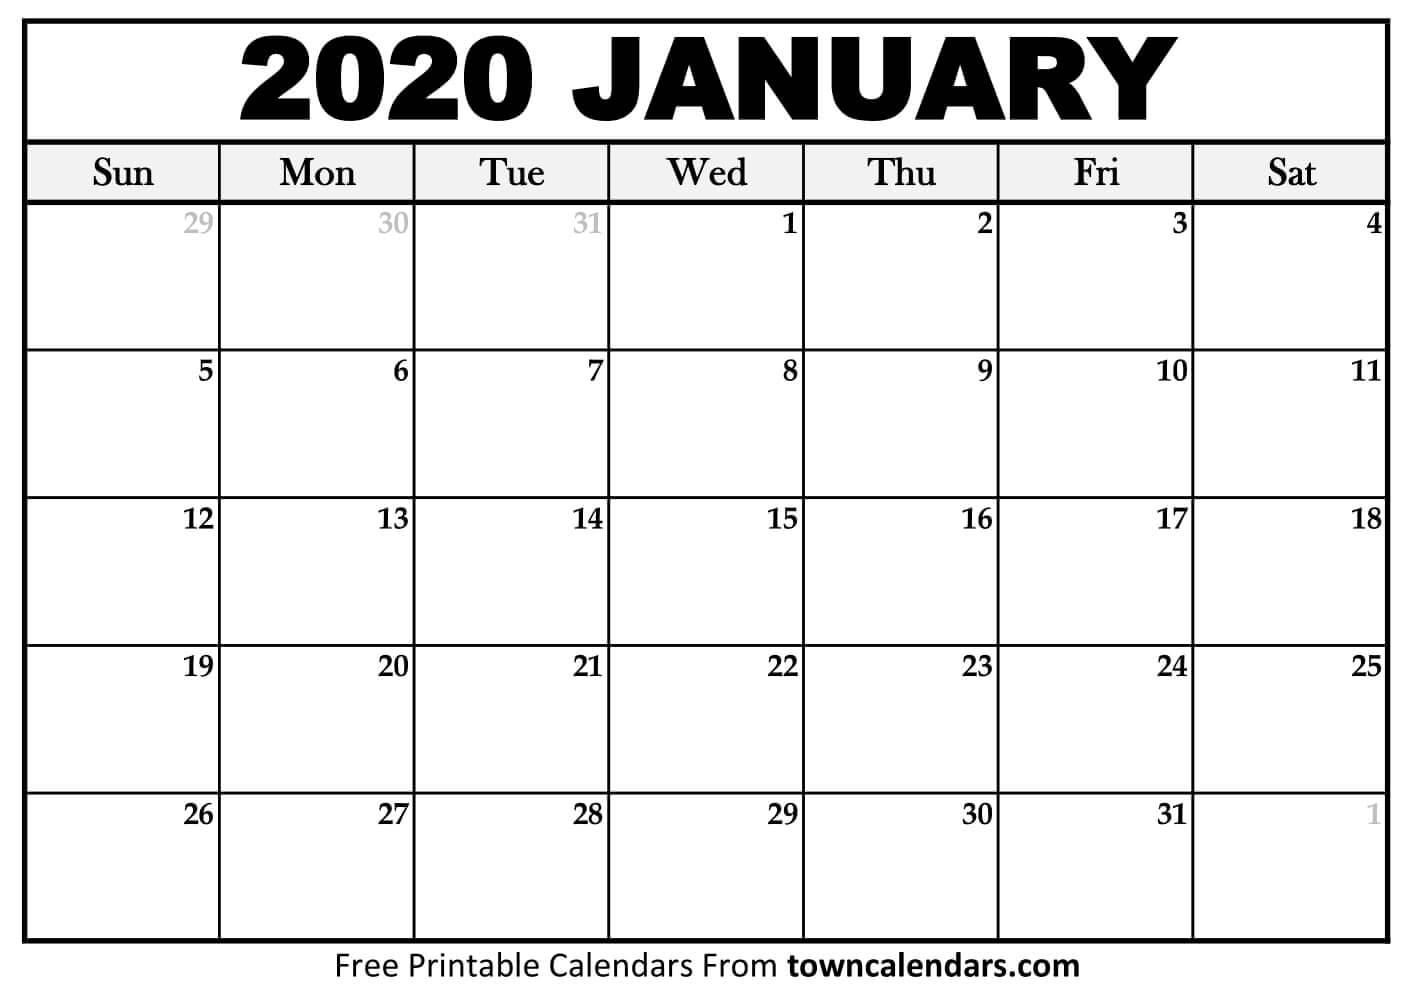 Printable Calendar Jan 2020